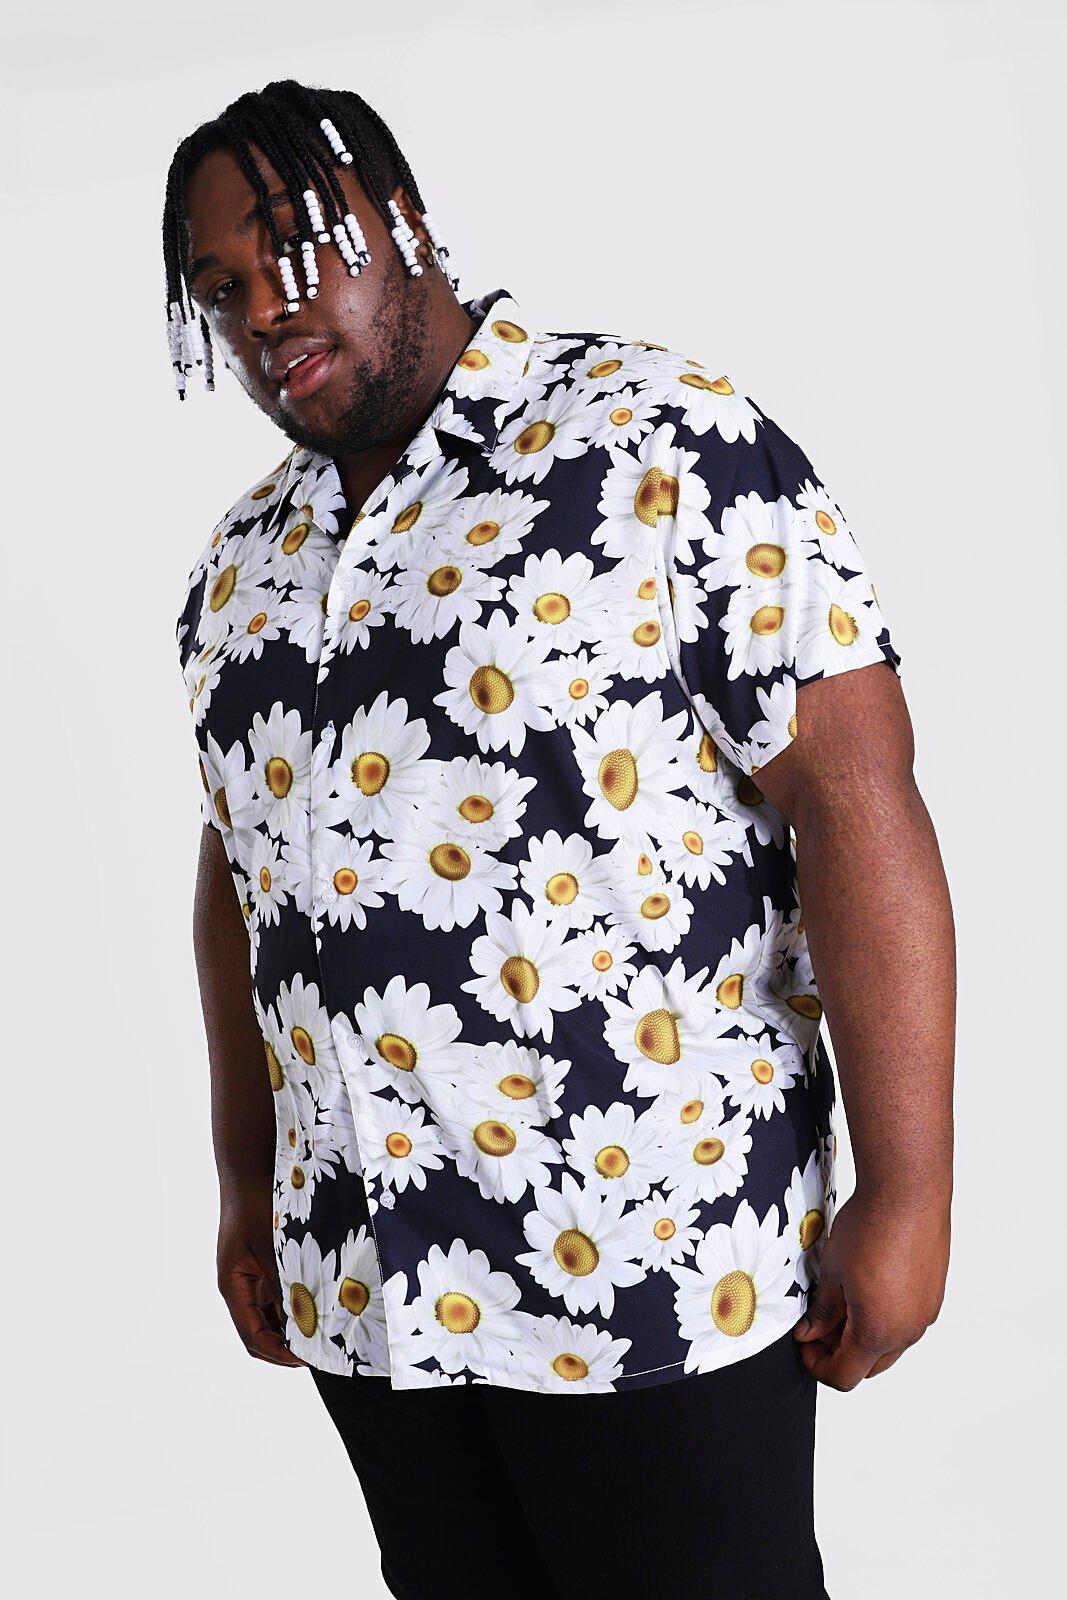 1960s Men's Clothing Mens Plus Size Short Sleeve Revere Daisy Shirt - Black $18.00 AT vintagedancer.com